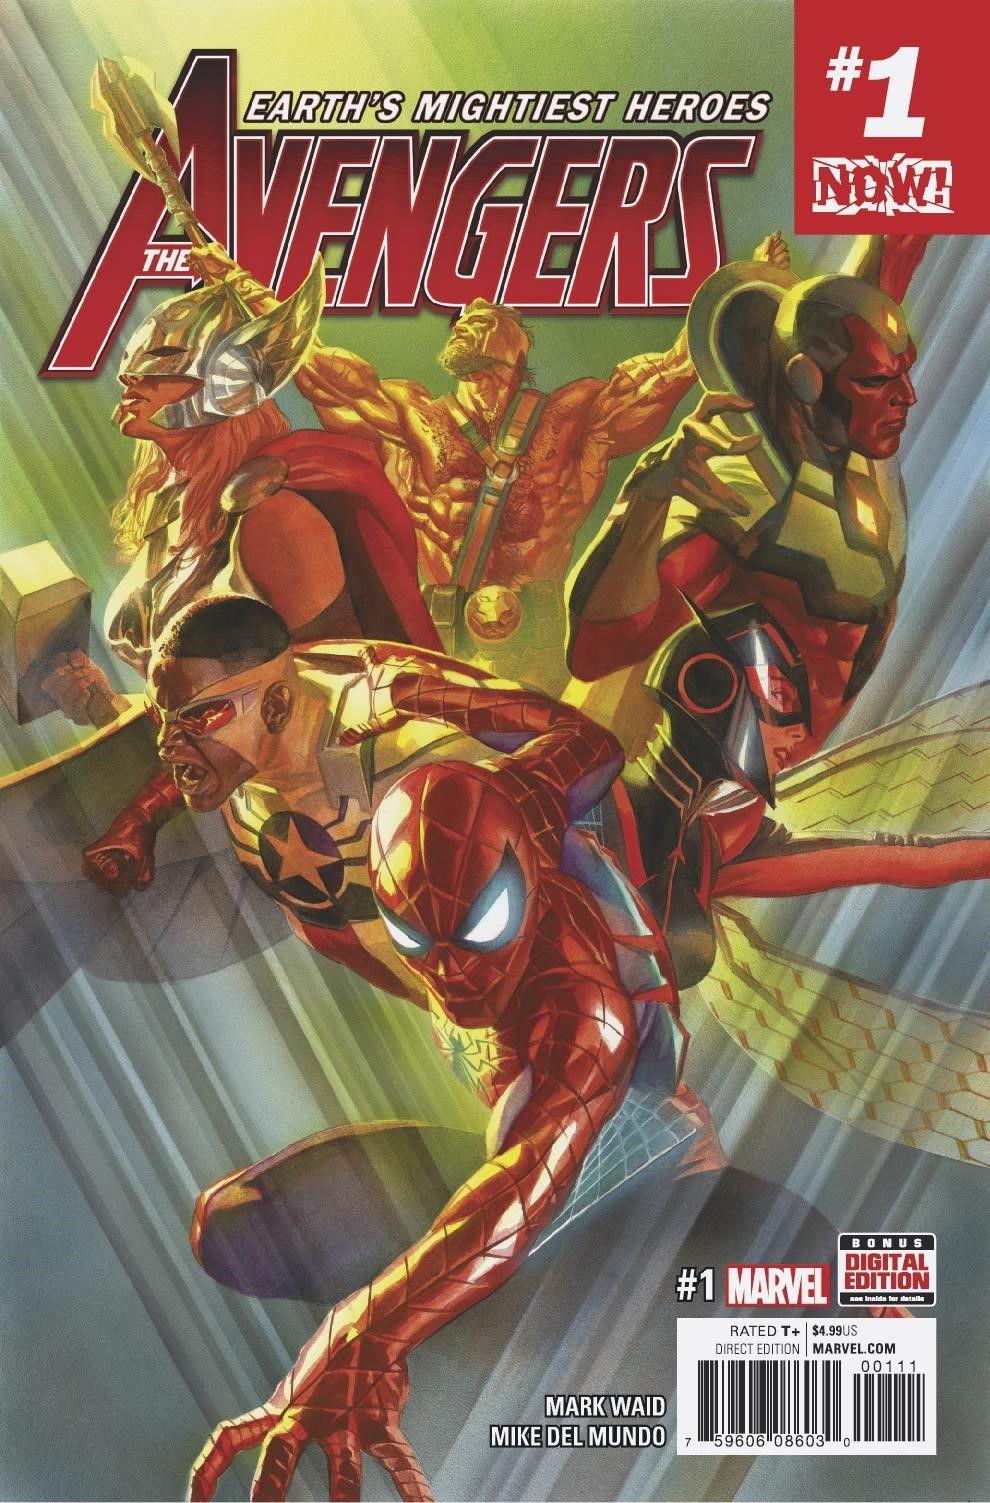 Avengers_1_Cover.jpg?itok=XIoUe0Mz